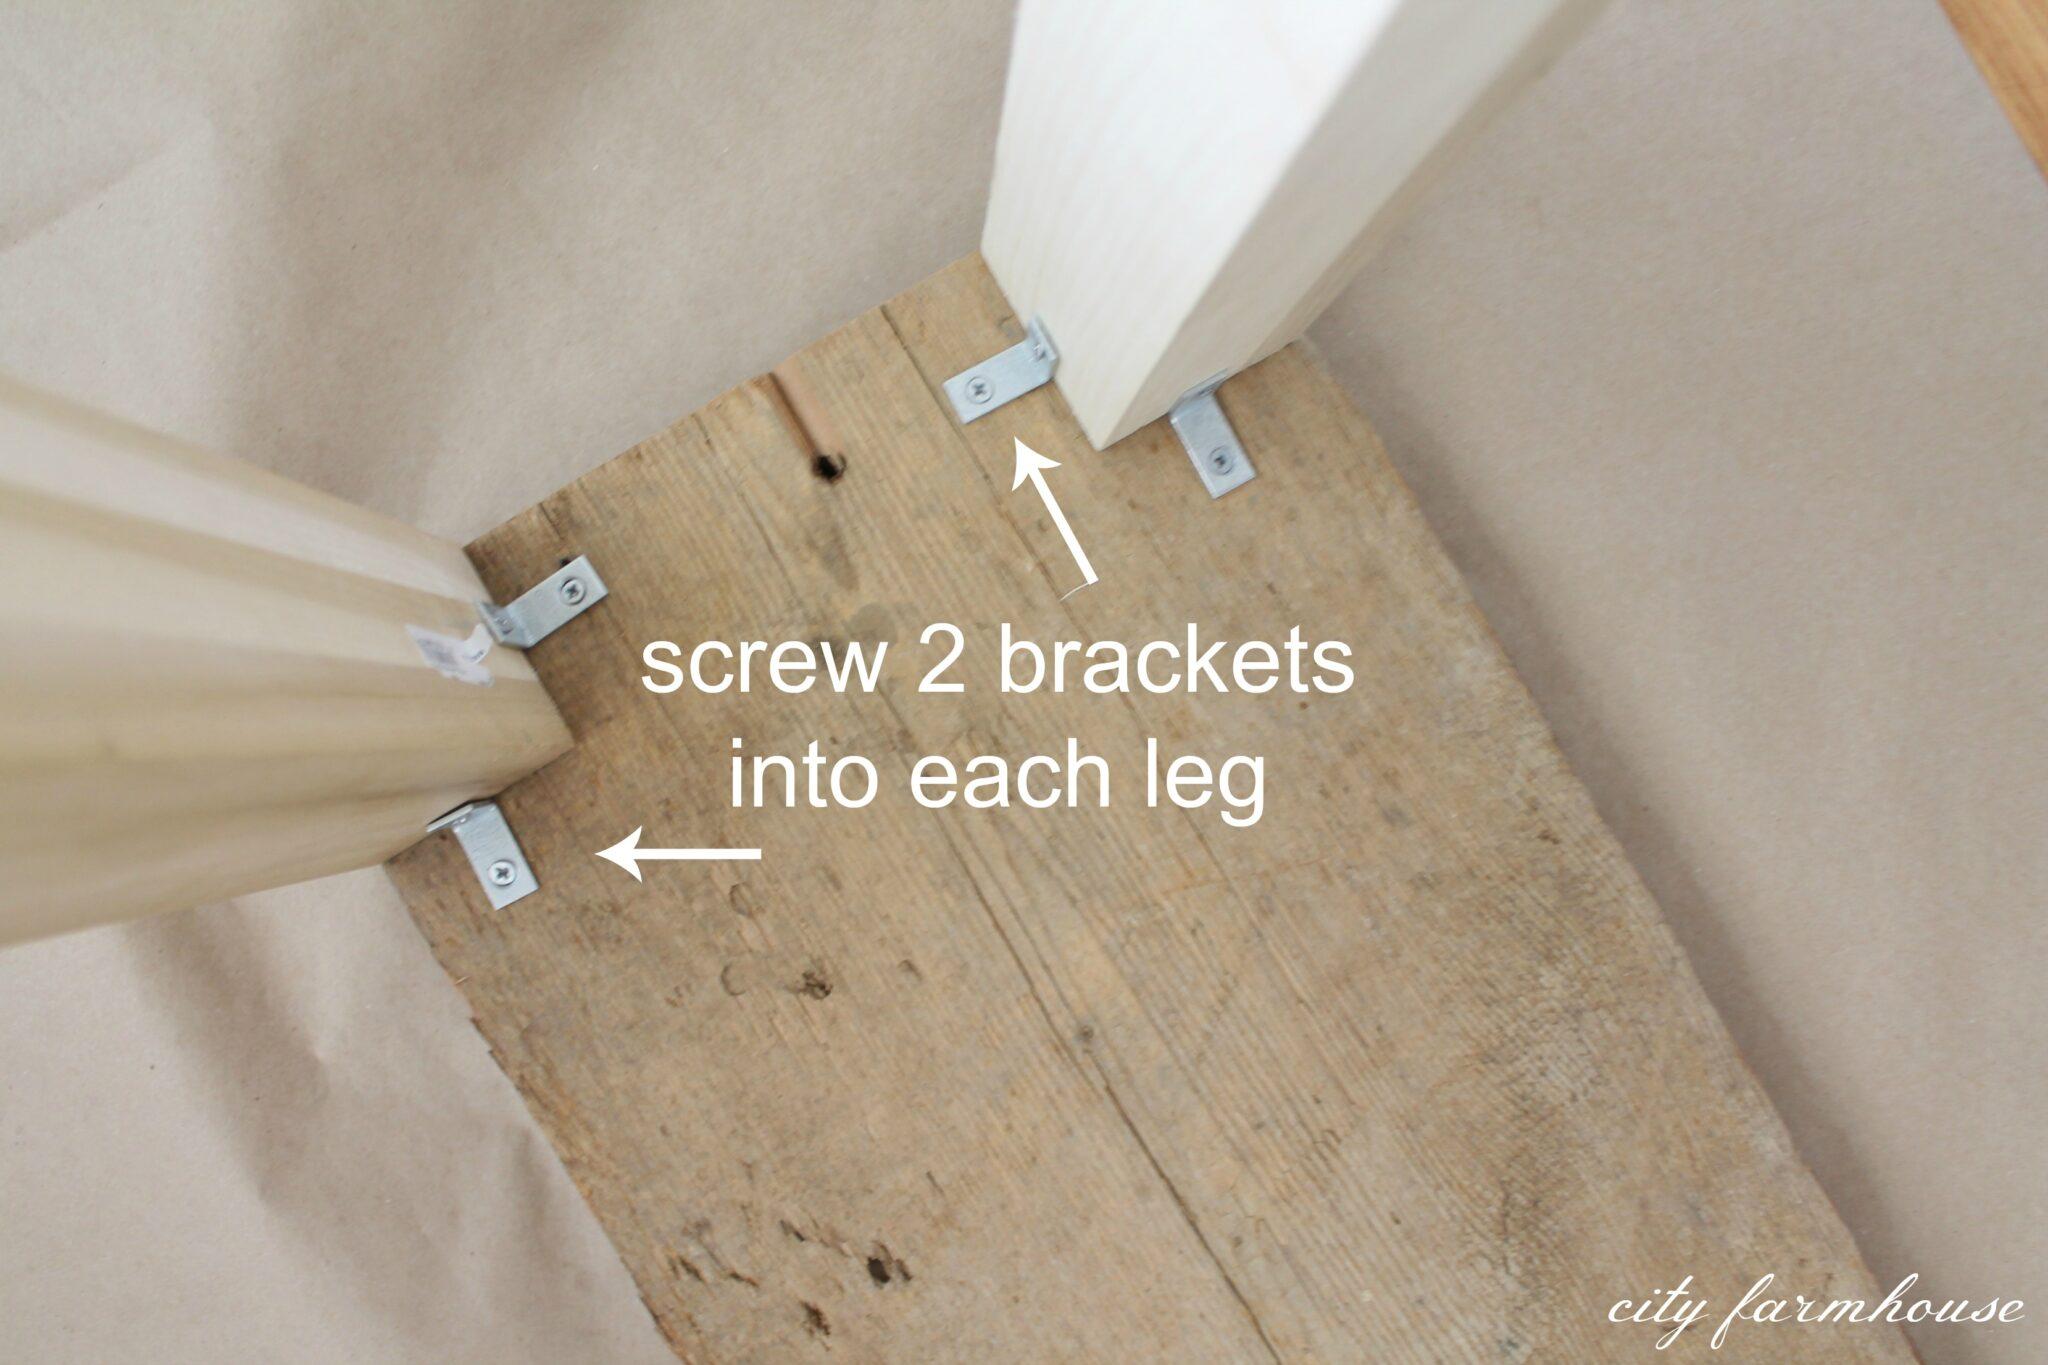 wooden sofa table legs studio bandung the easiest diy reclaimed wood city farmhouse screw brackets into